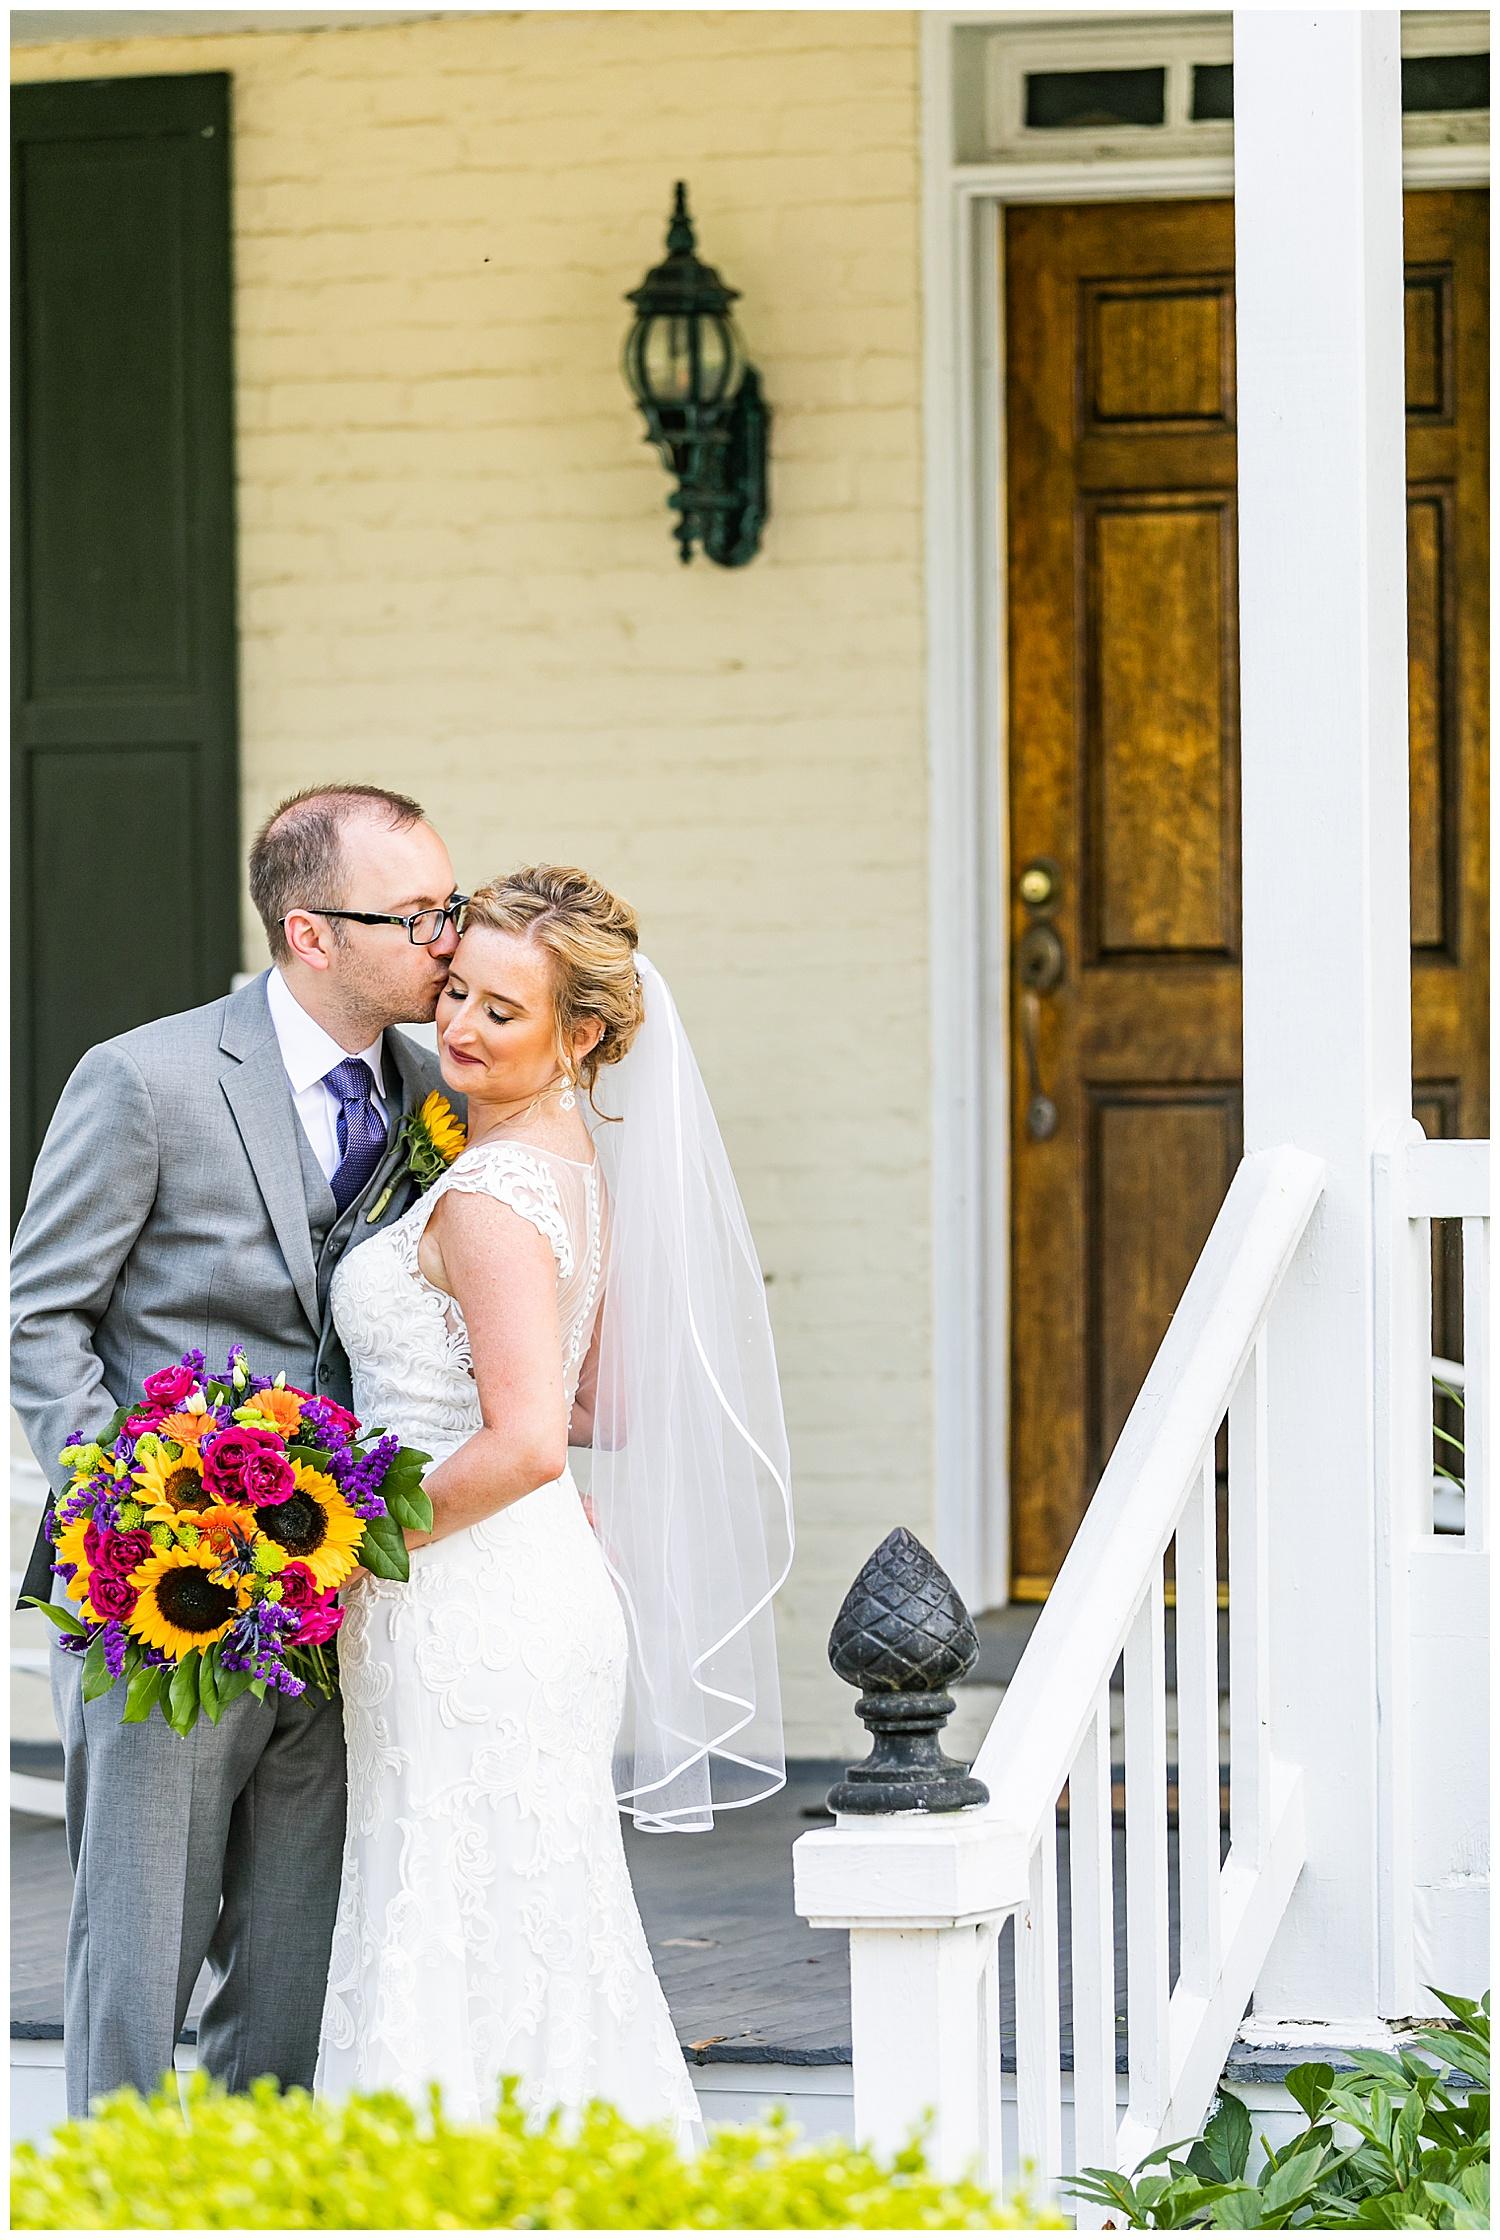 Michelle Shaun Antrim 1844 Wedding Living Radiant Photography photos_0051.jpg